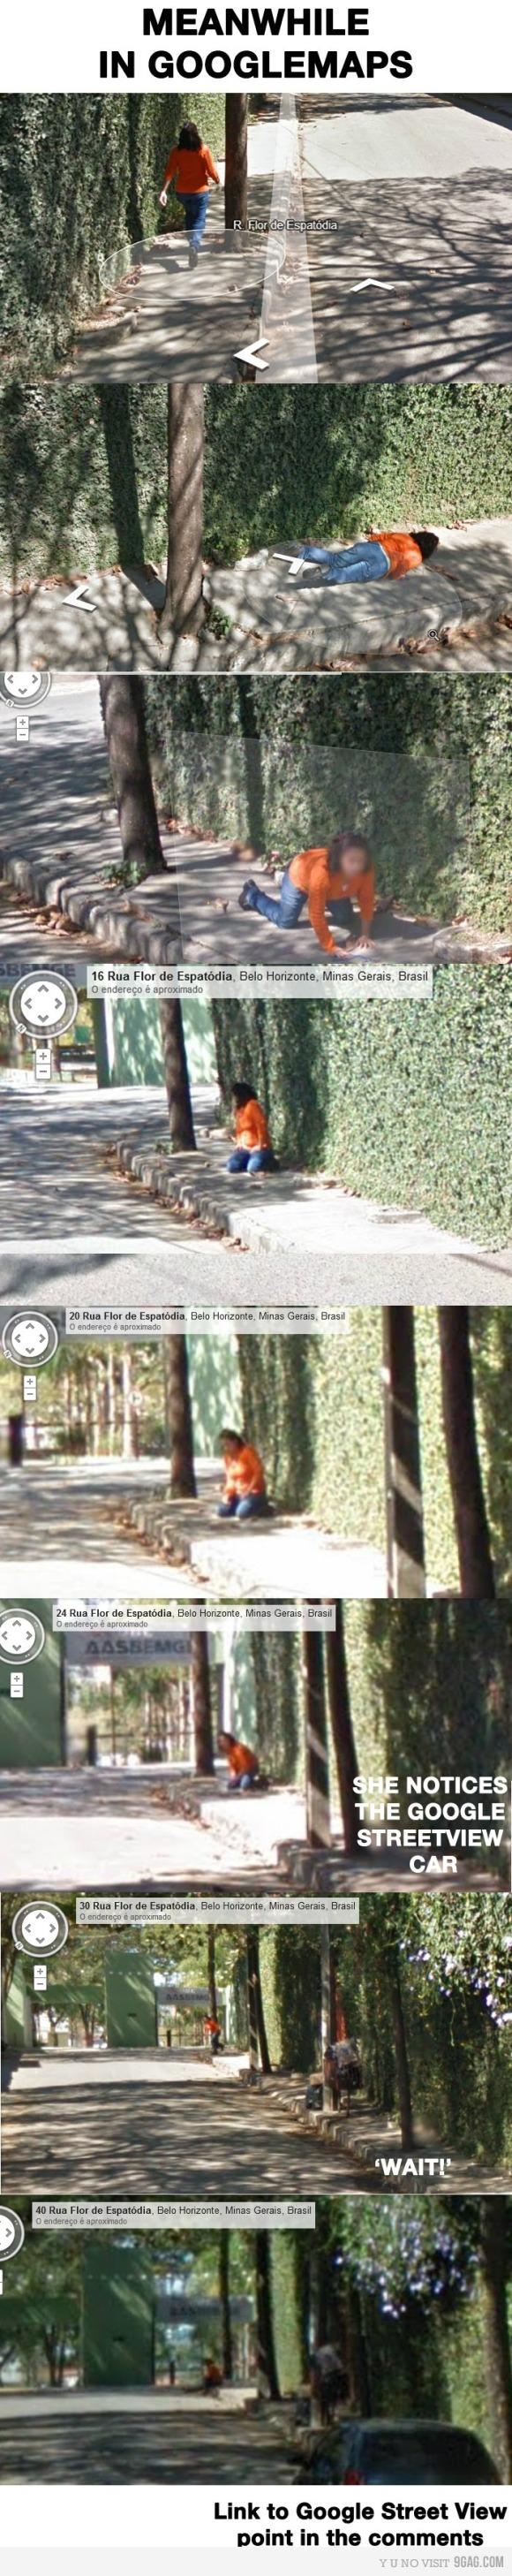 Fall in Google Street View